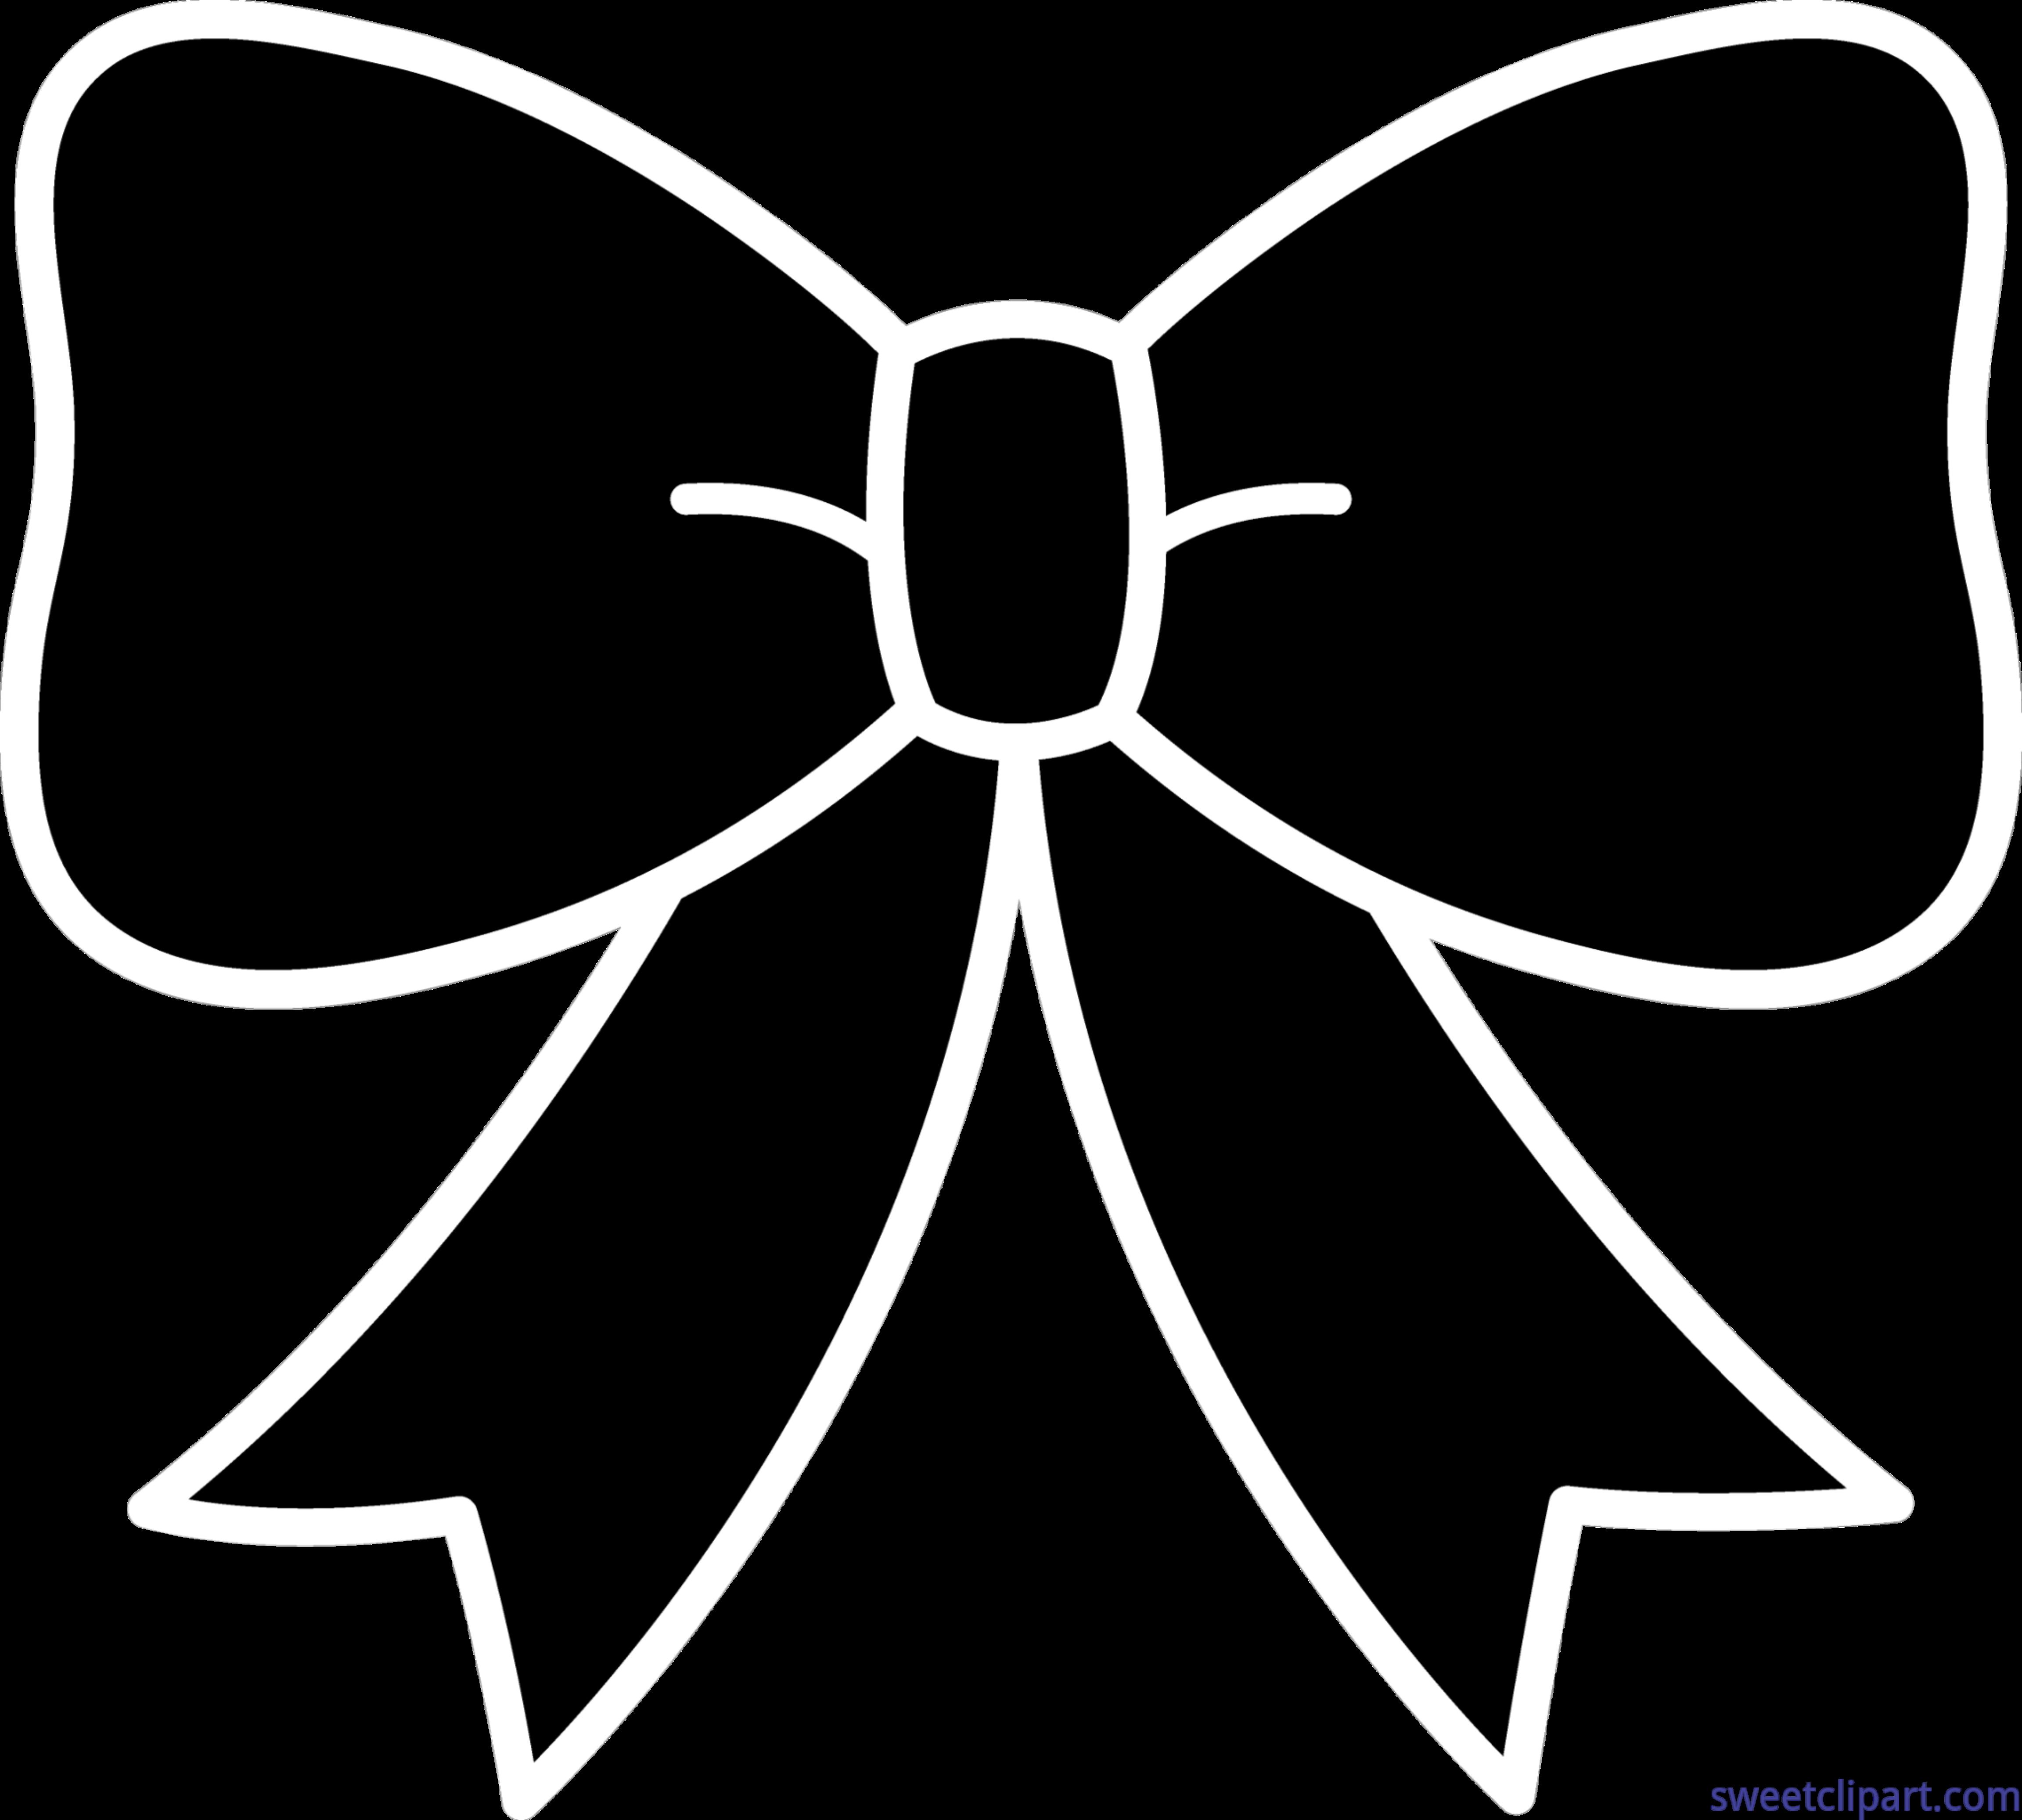 Bow Ribbon Silhouette Clip Art - Sweet Clip Art